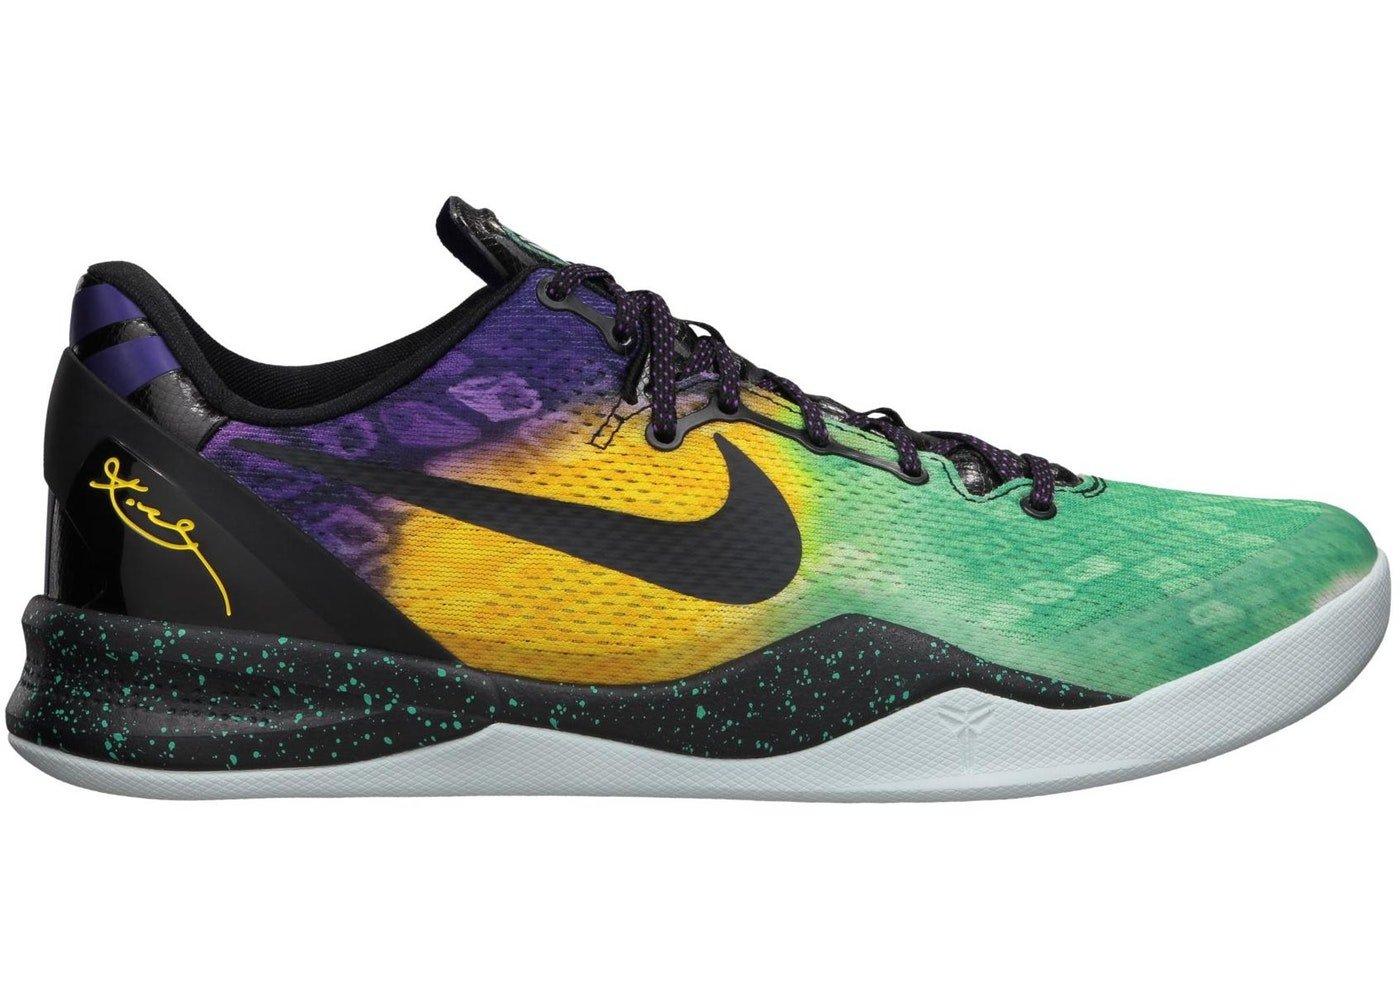 super popular a1fb6 b78ac Amazon.com  Nike Kobe 8 System Easter Fiberglass Court Purple-Black-Laser  Purple Size 14  Sports   Outdoors